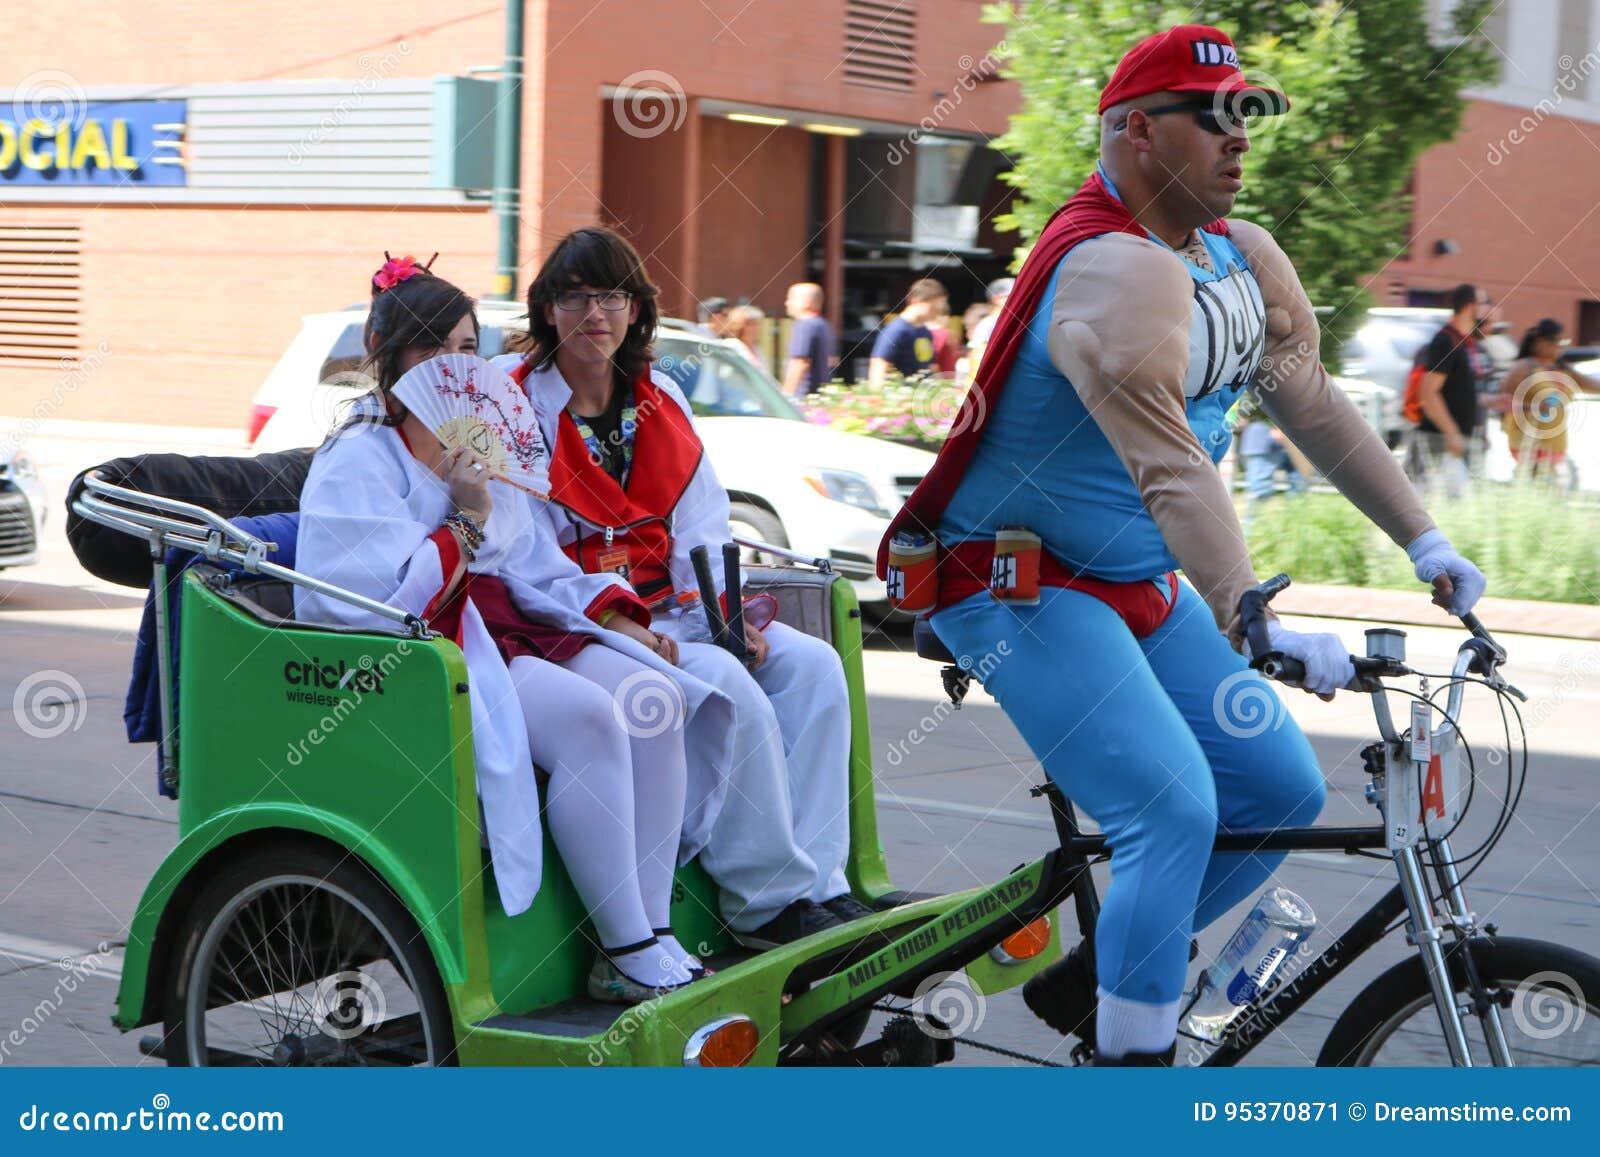 Denver, Colorado, USA - July 1, 2017: Duffman driving two geishas in a pedicab at Denver Comic Con